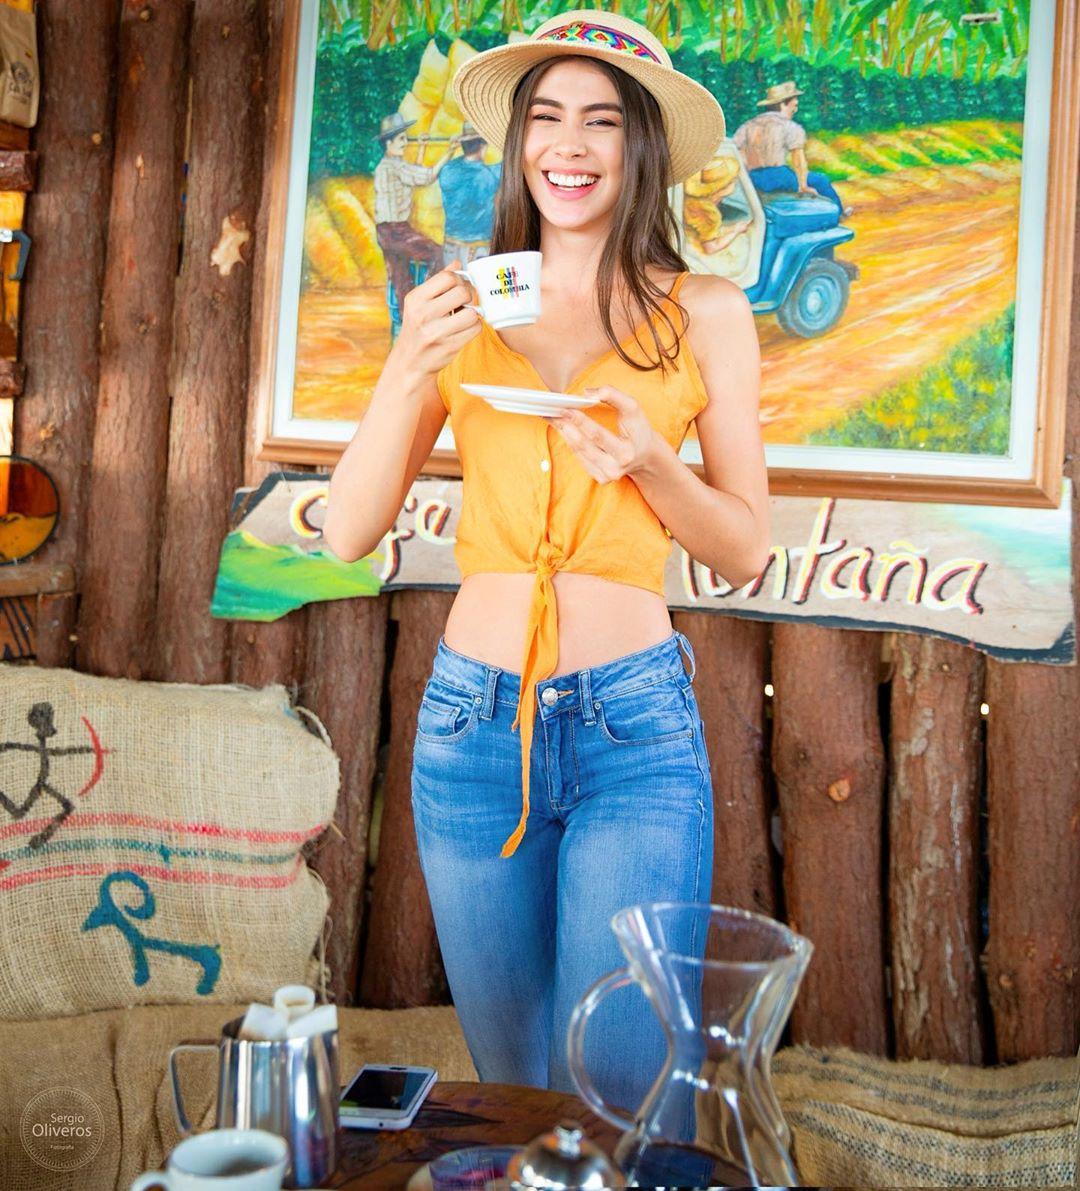 alejandra salazar, miss international colombia 2021. 91243910